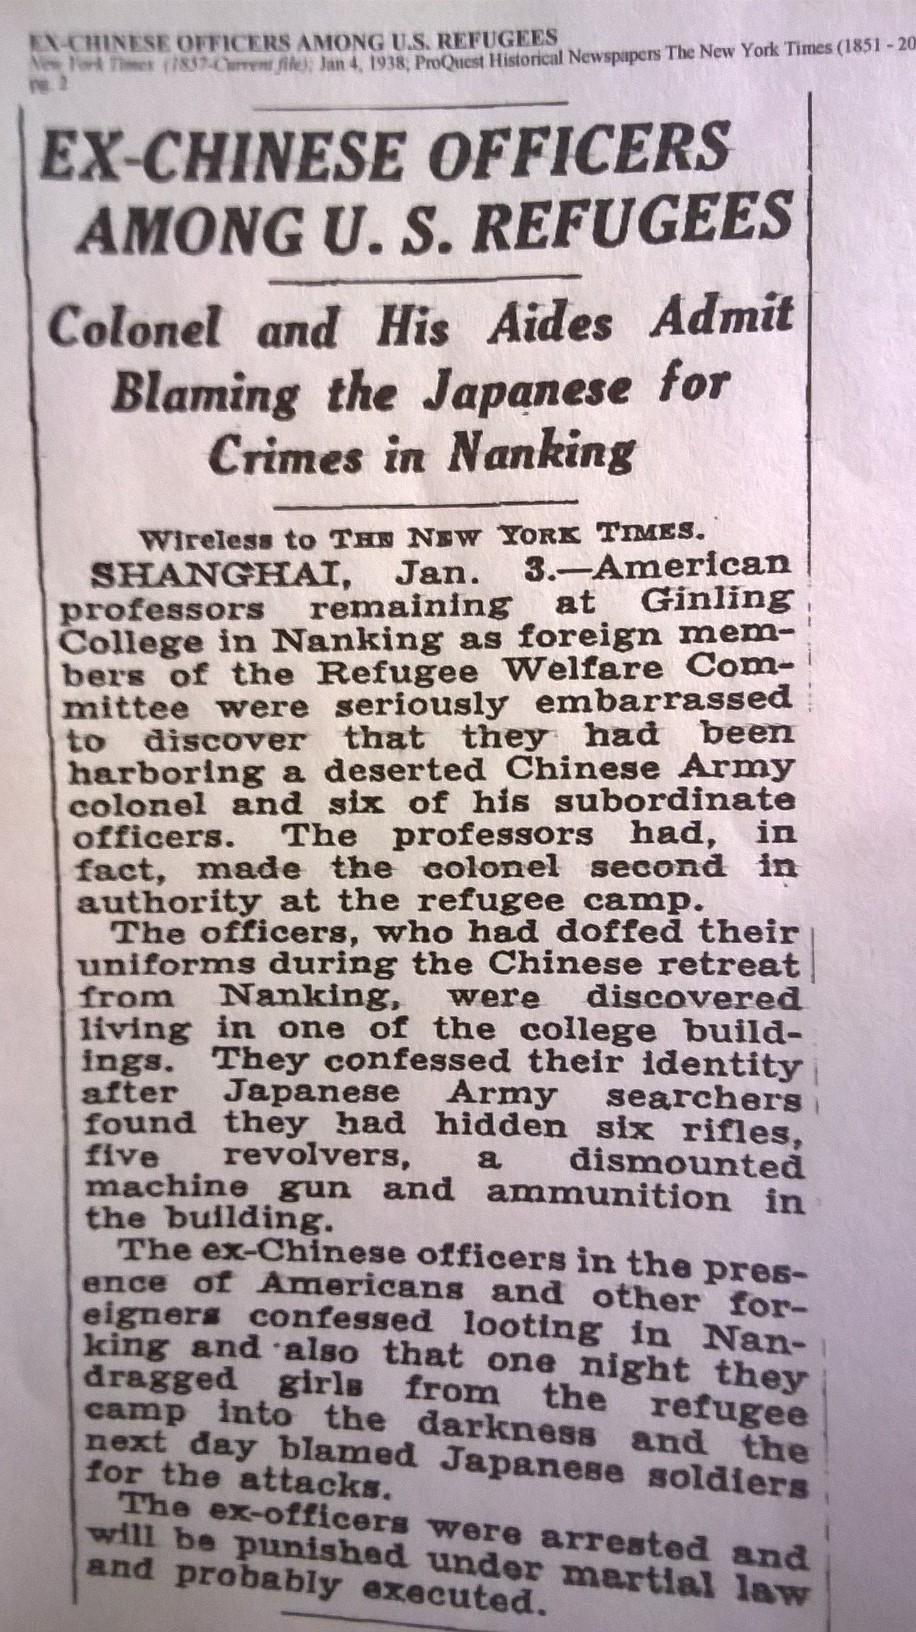 NYT 4 JAN 1938 B